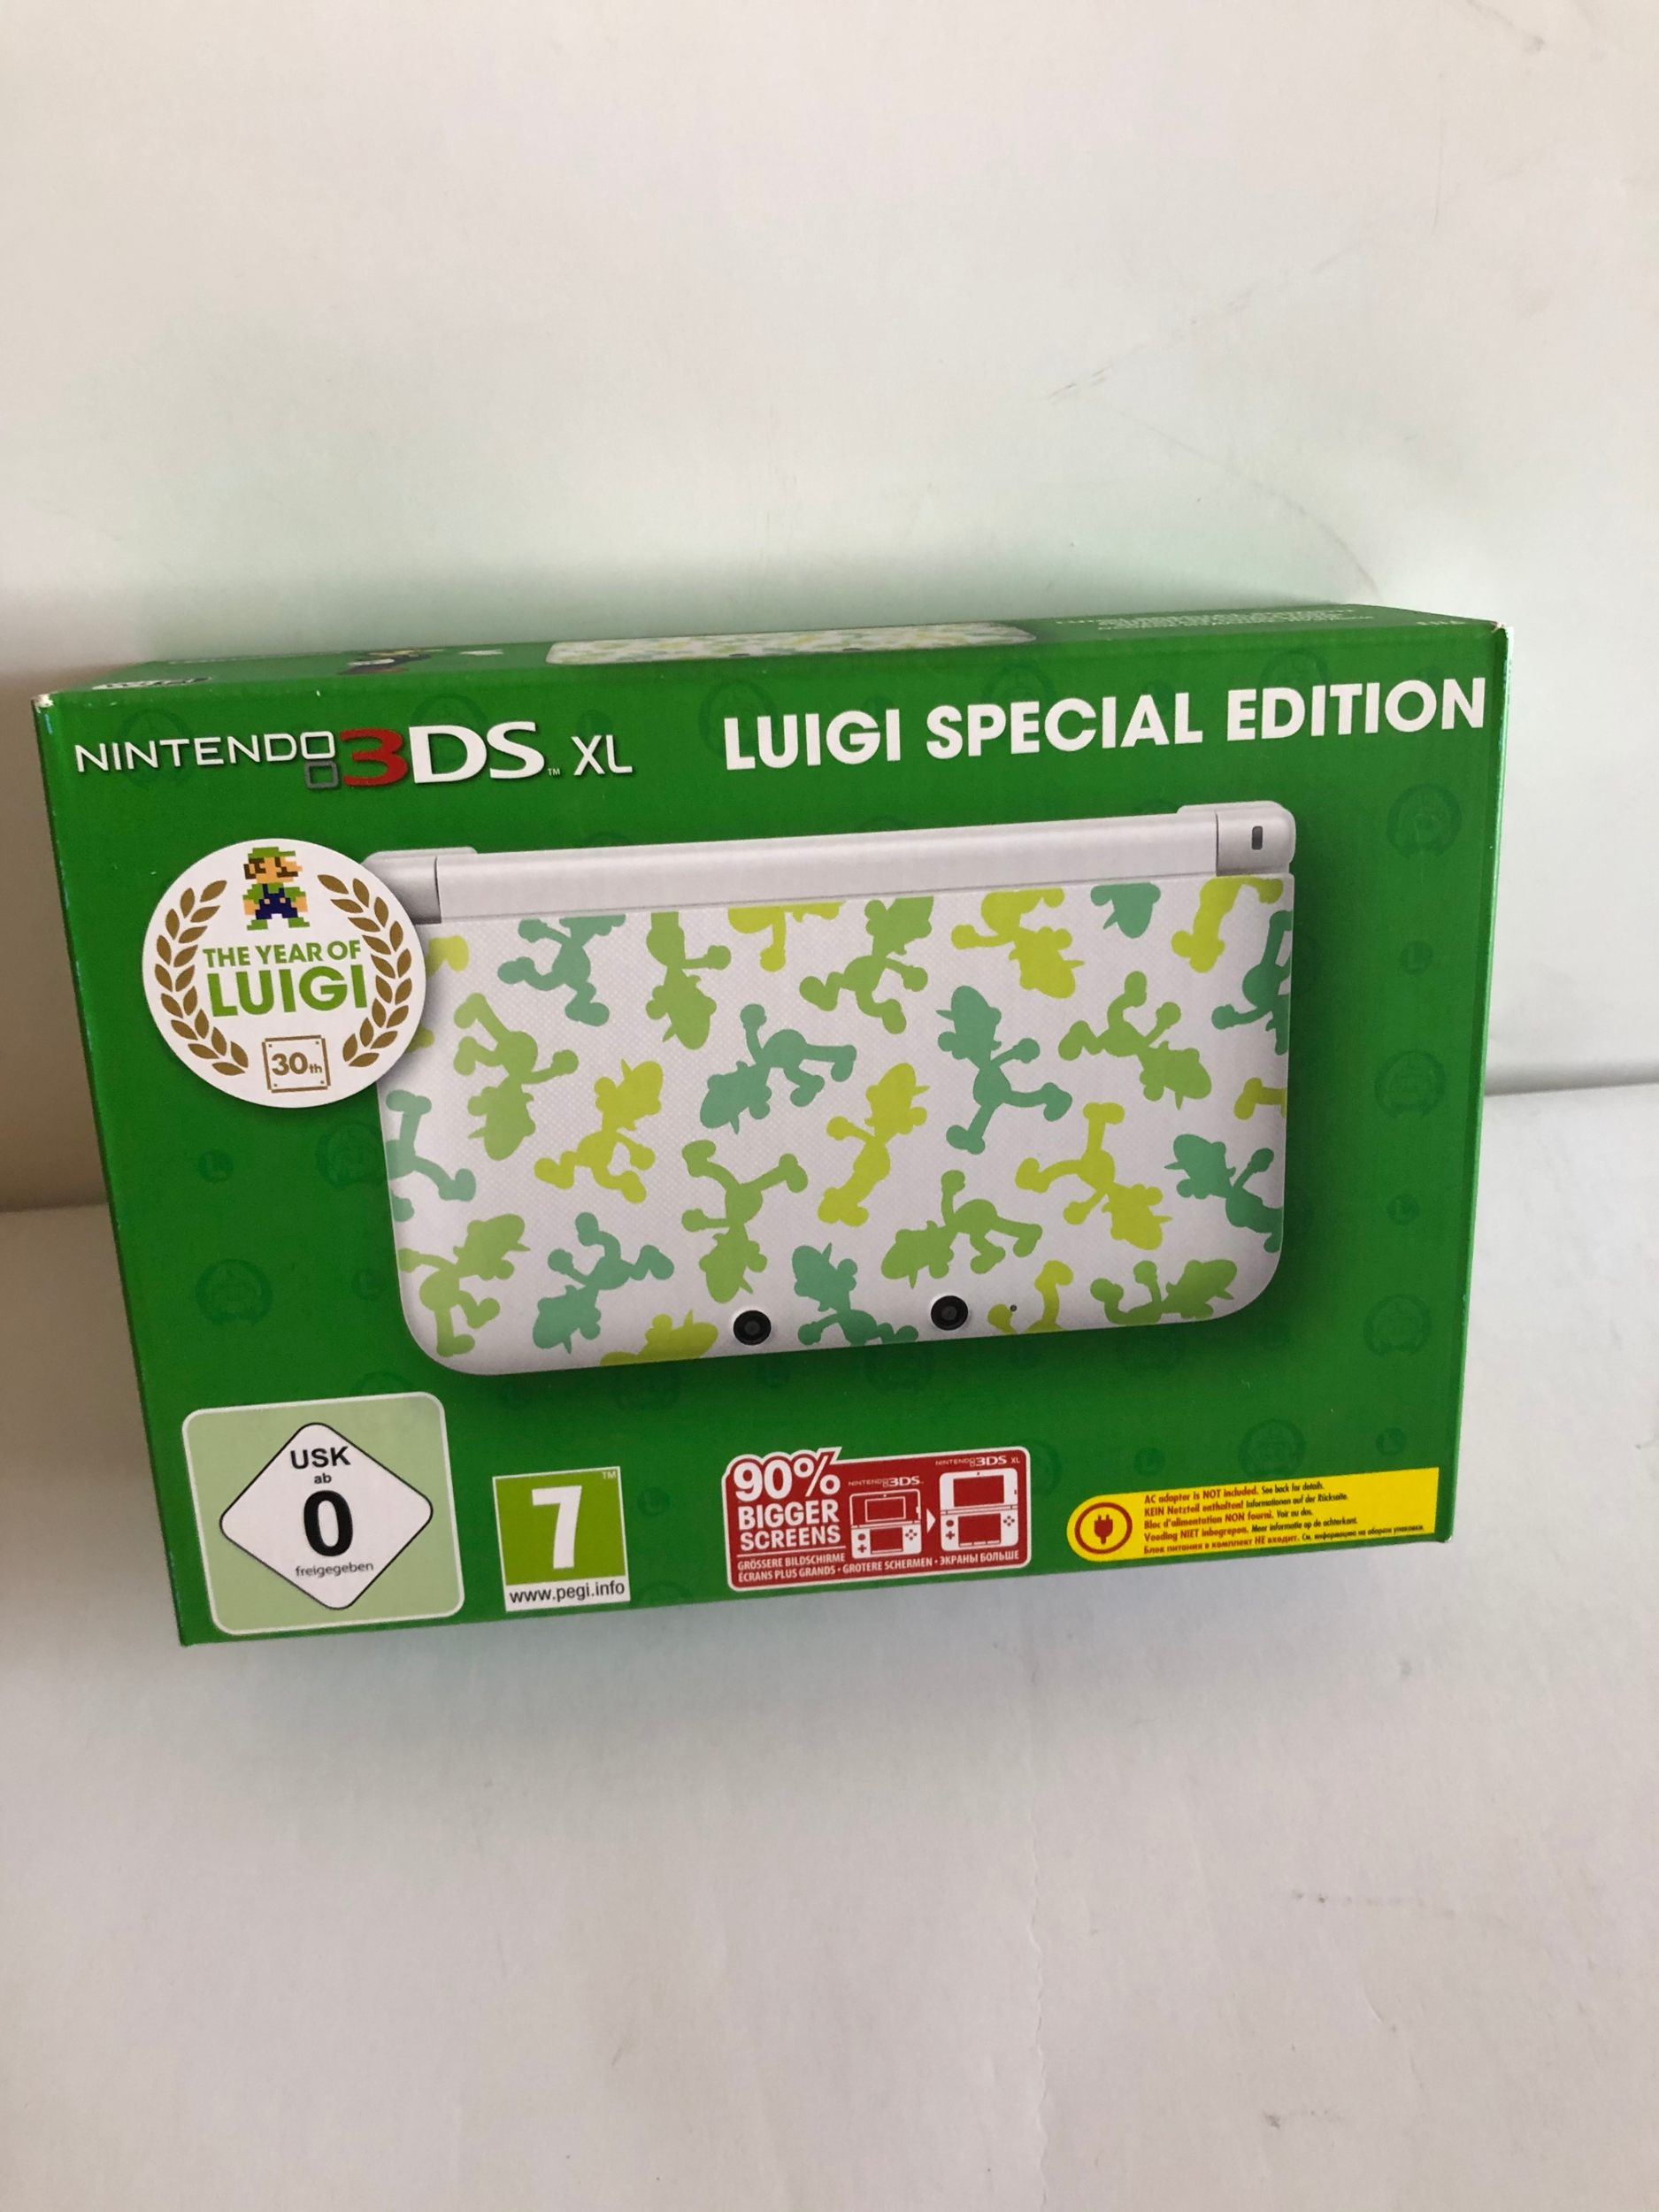 3DS XL console - Luigi Special Edition